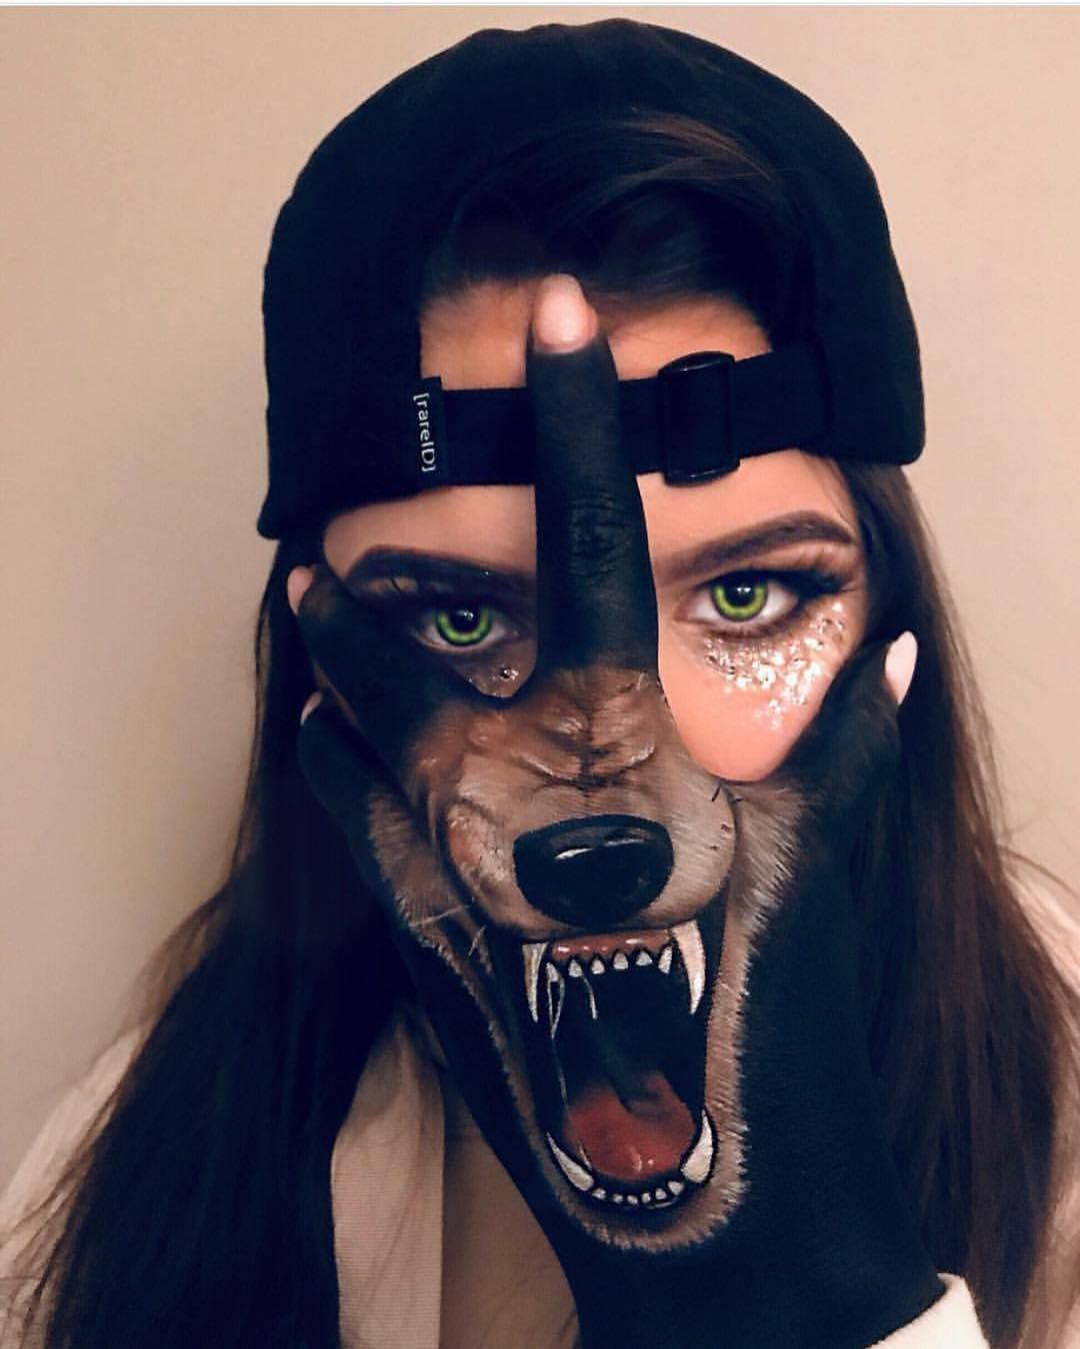 Hand Mouth Tattoo : mouth, tattoo, 🐾Big, Wolf🐾🐺, @jennimacrimakeup, 🖤Inspired, @idamonicas, FOLLOW, @100daysofmakeup, @atarah_m…, Skull, Tattoo,, Tattoos,, Tattoos